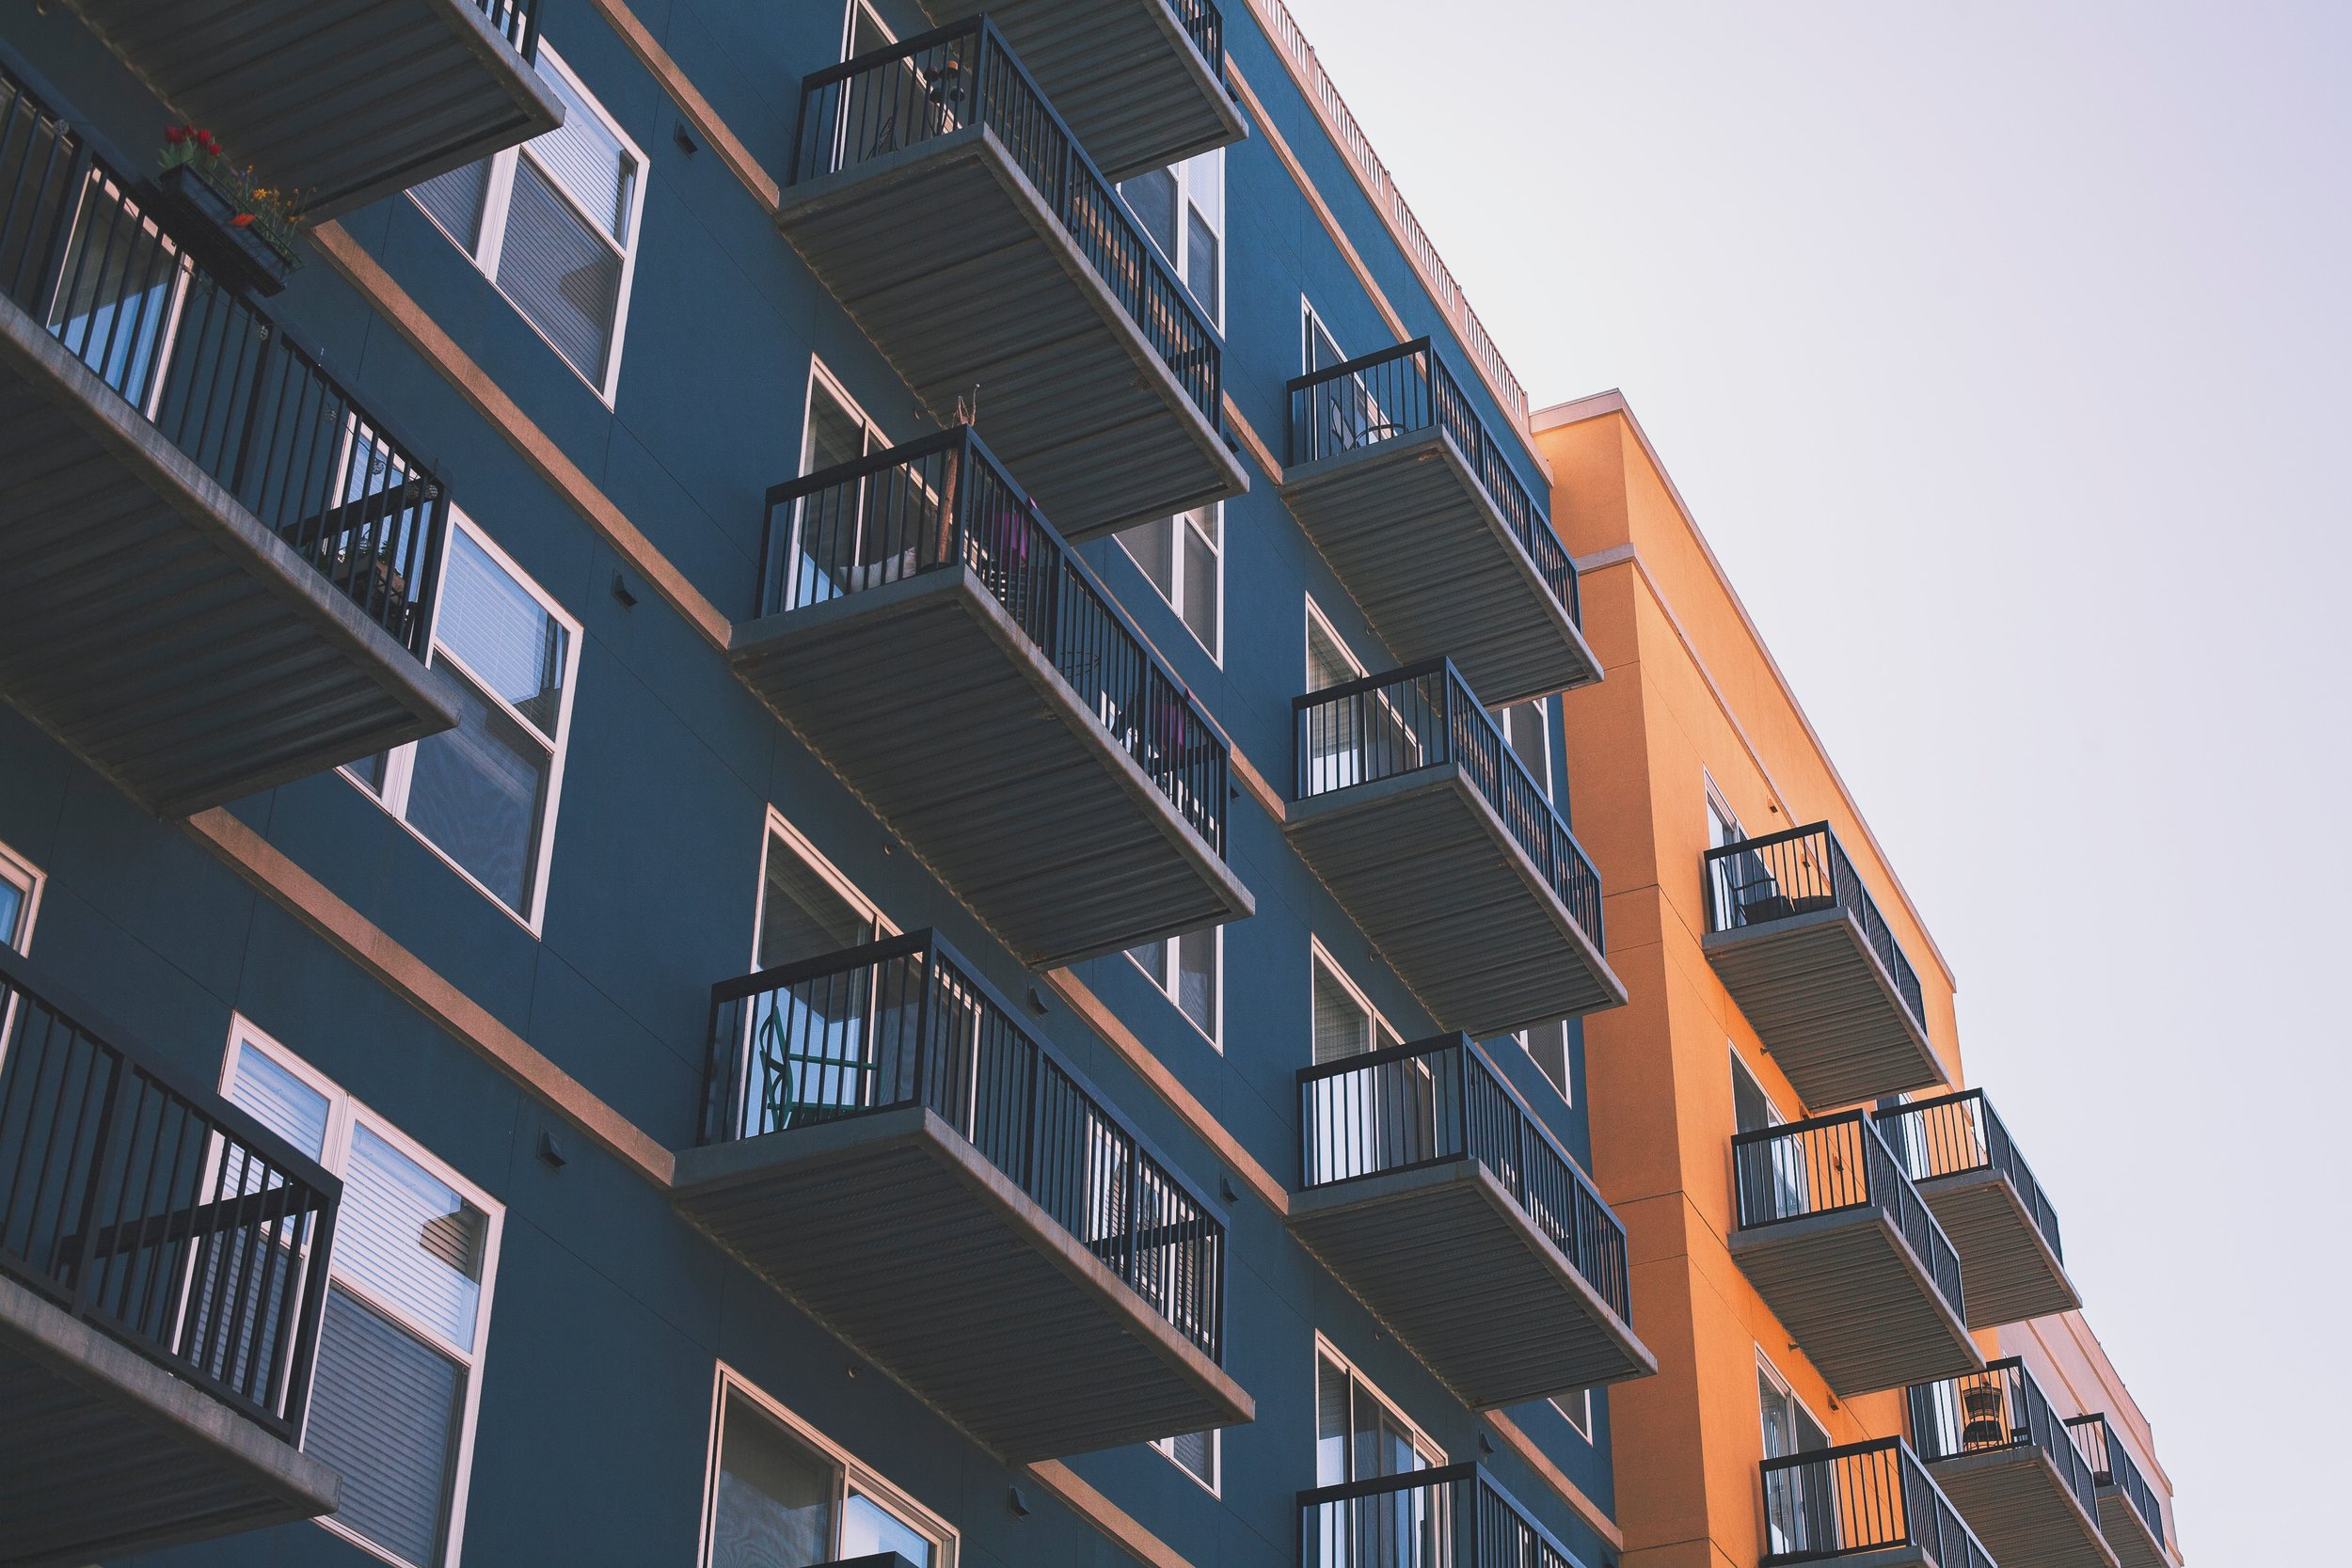 real-estate-lawyer-attorney-Minneapolis-landlord-tenant-disputes.jpg